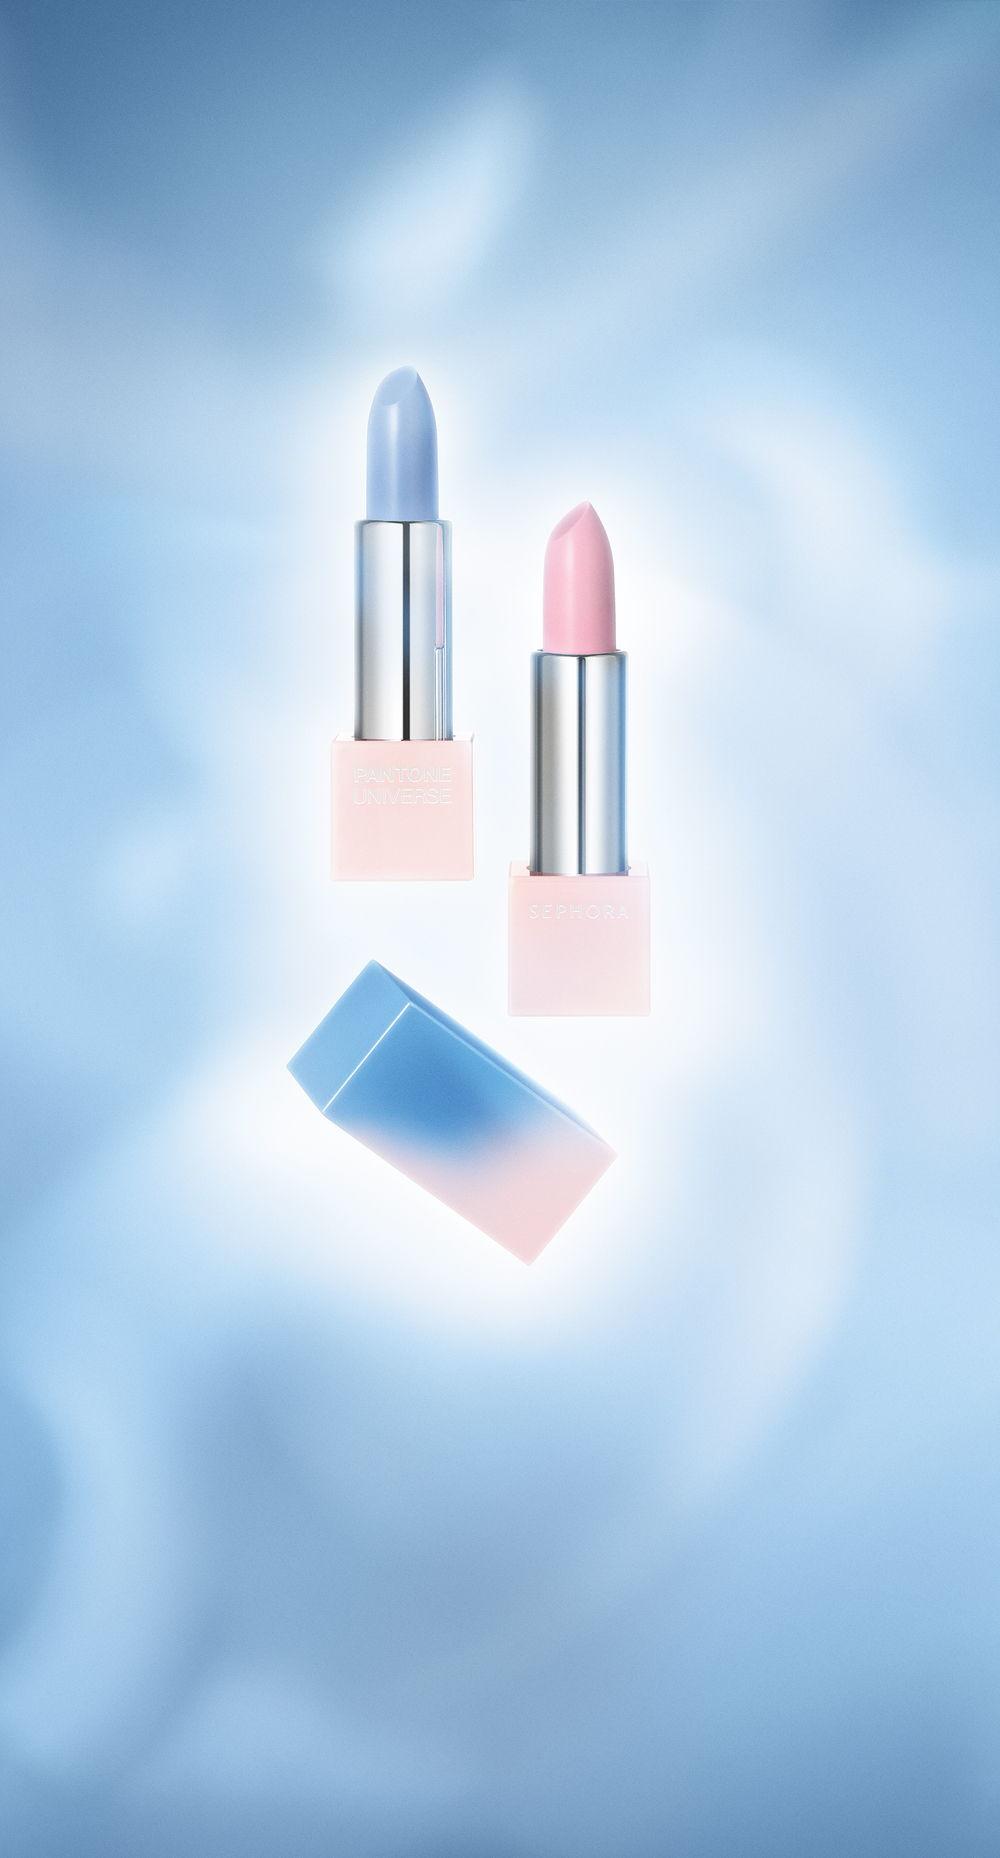 Credit_SEPHORA + PANTONE UNIVERSE Color of the Year 2016 Lipsticks.jpg